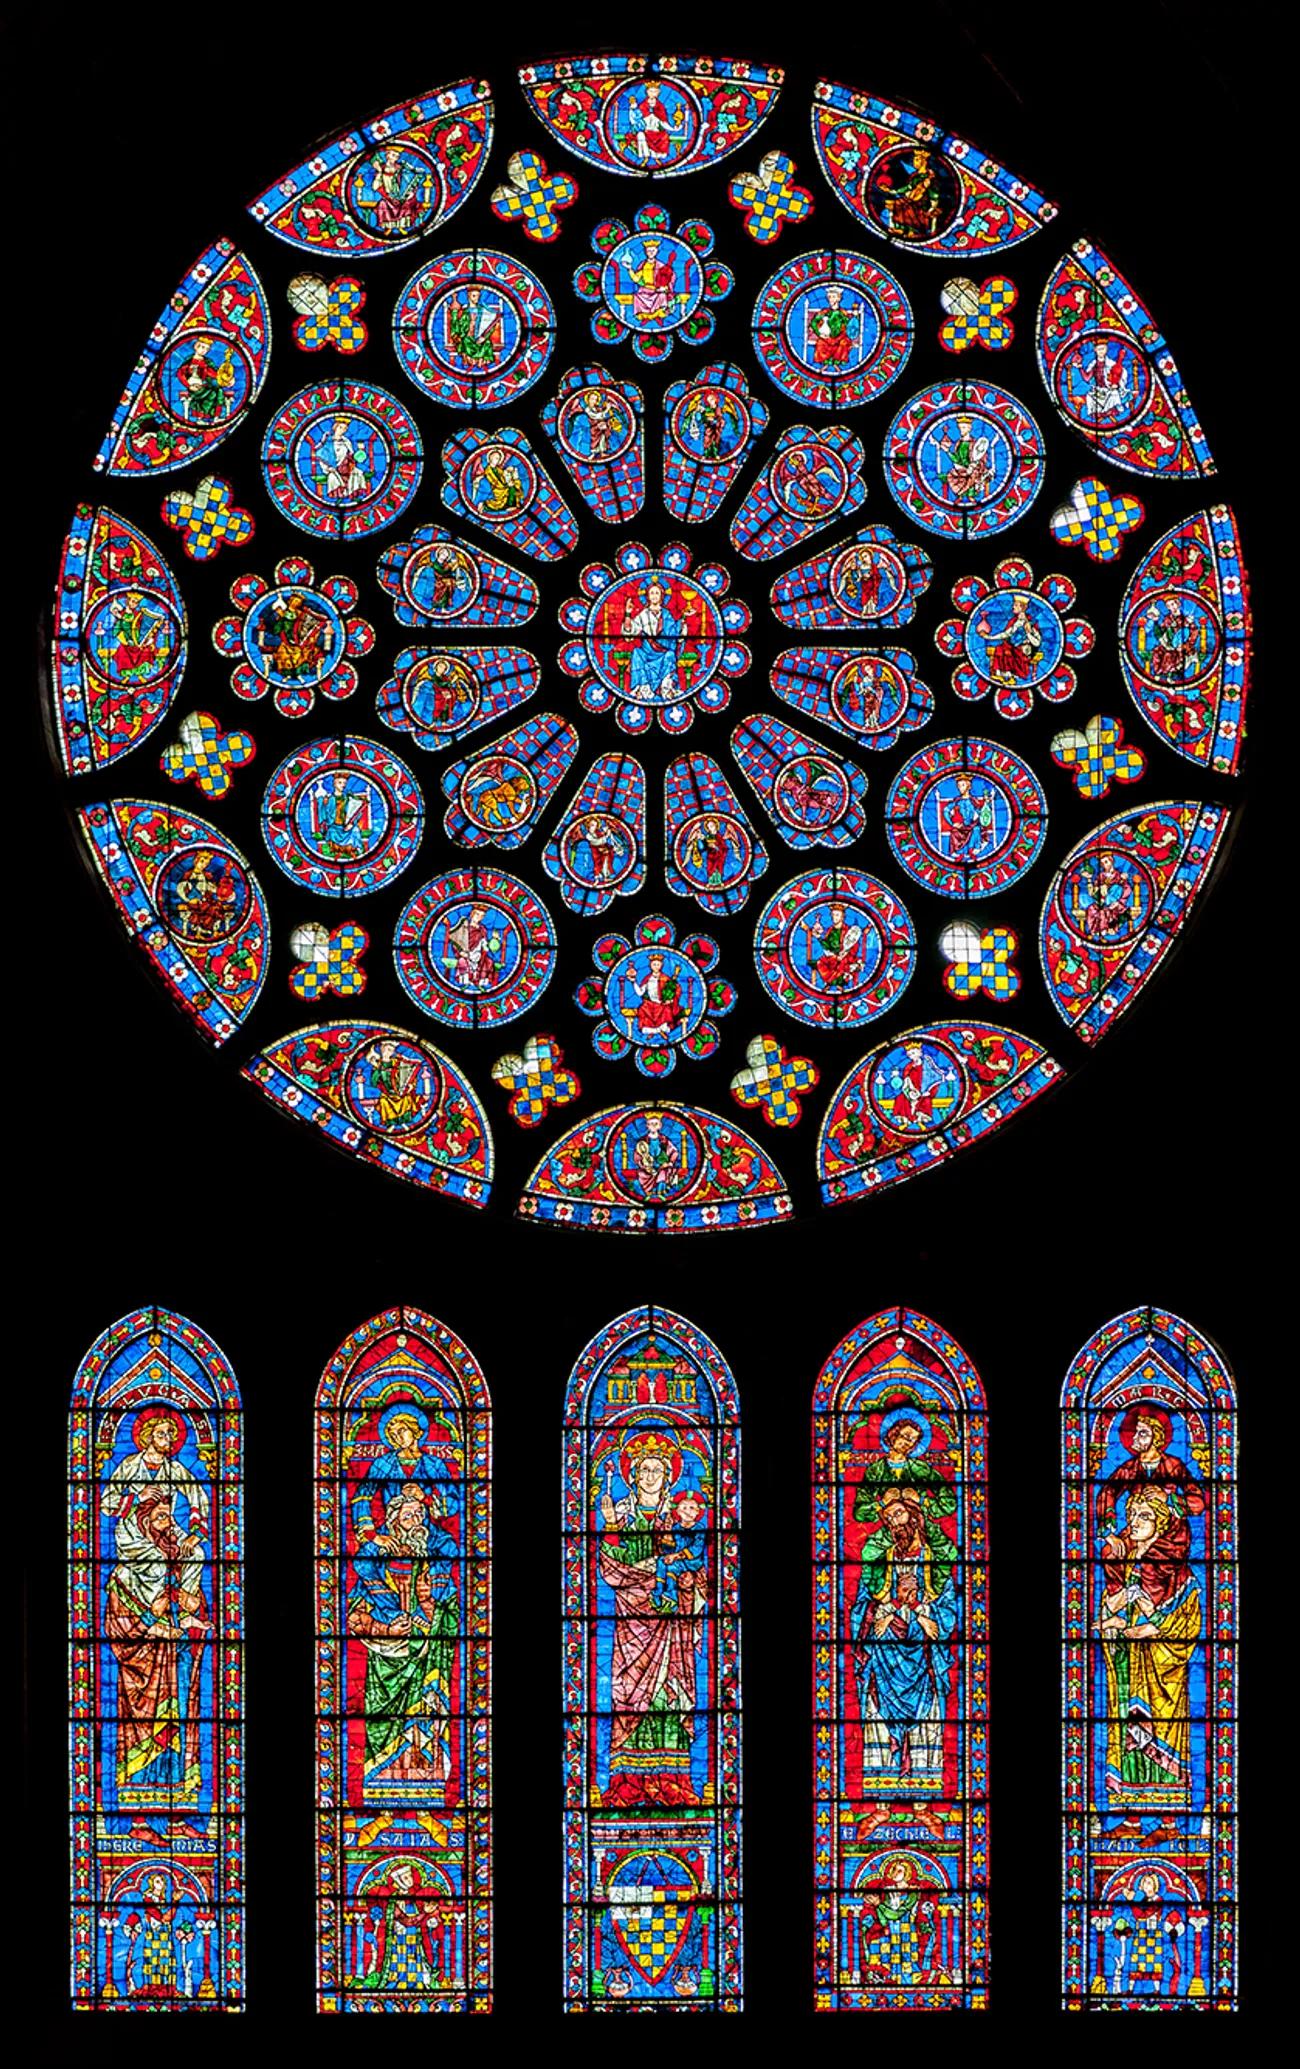 Витражи Шартрского собораPtrQs / Wikimedia Commons (CC BY-SA 3.0)